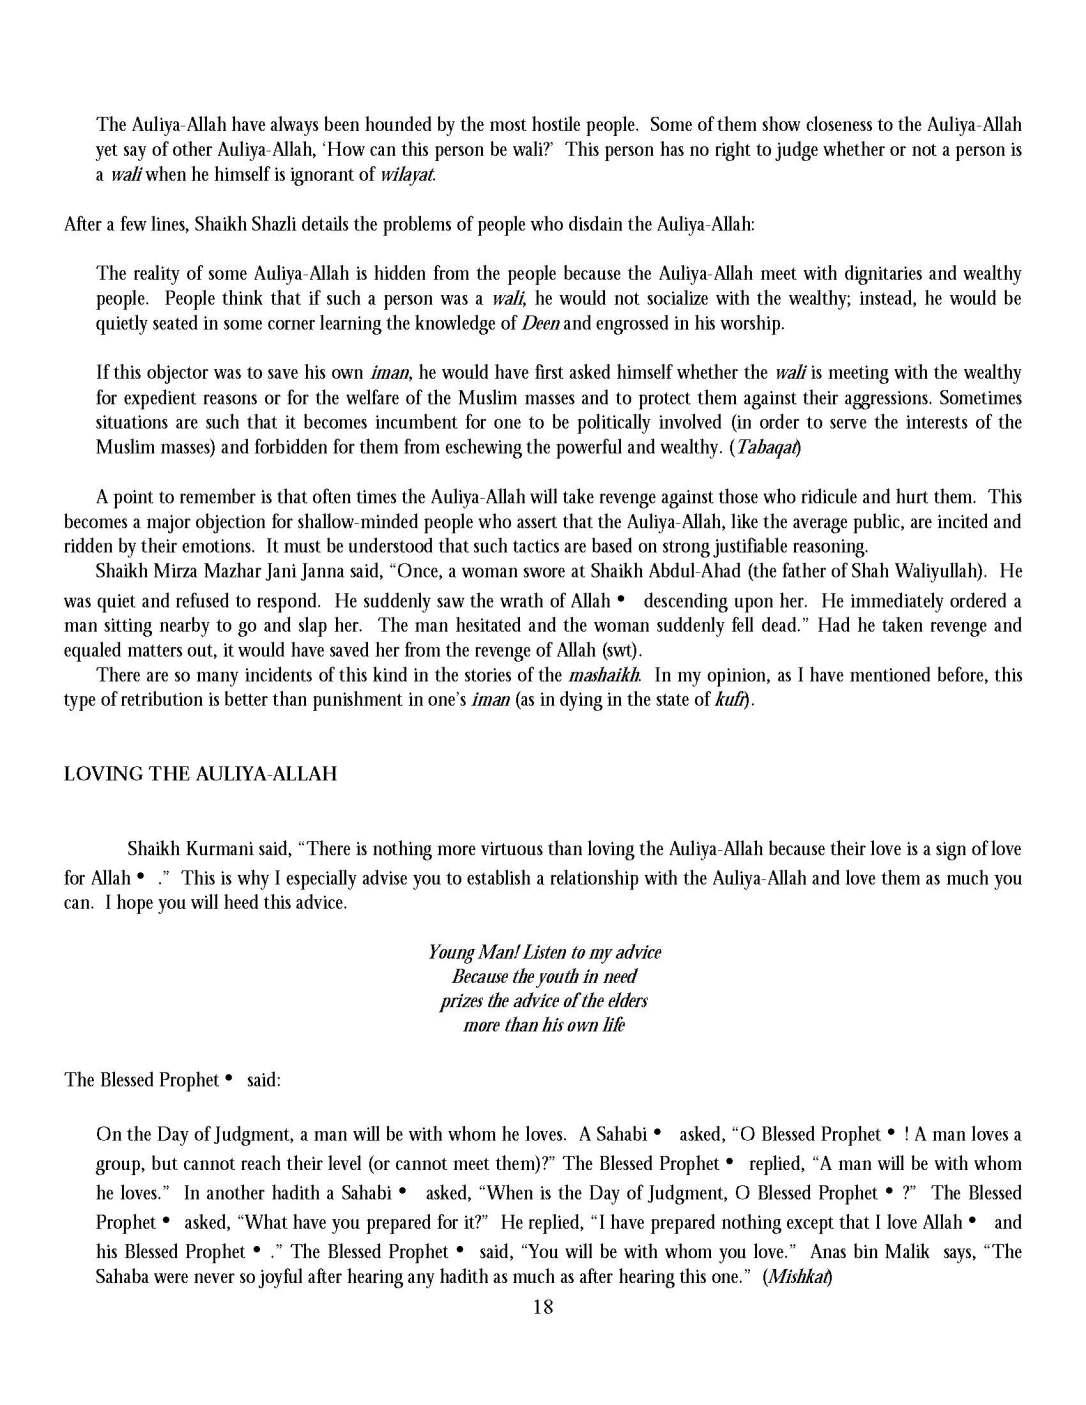 ConsequencesOfDebasingAuliyaAllah_Page_19